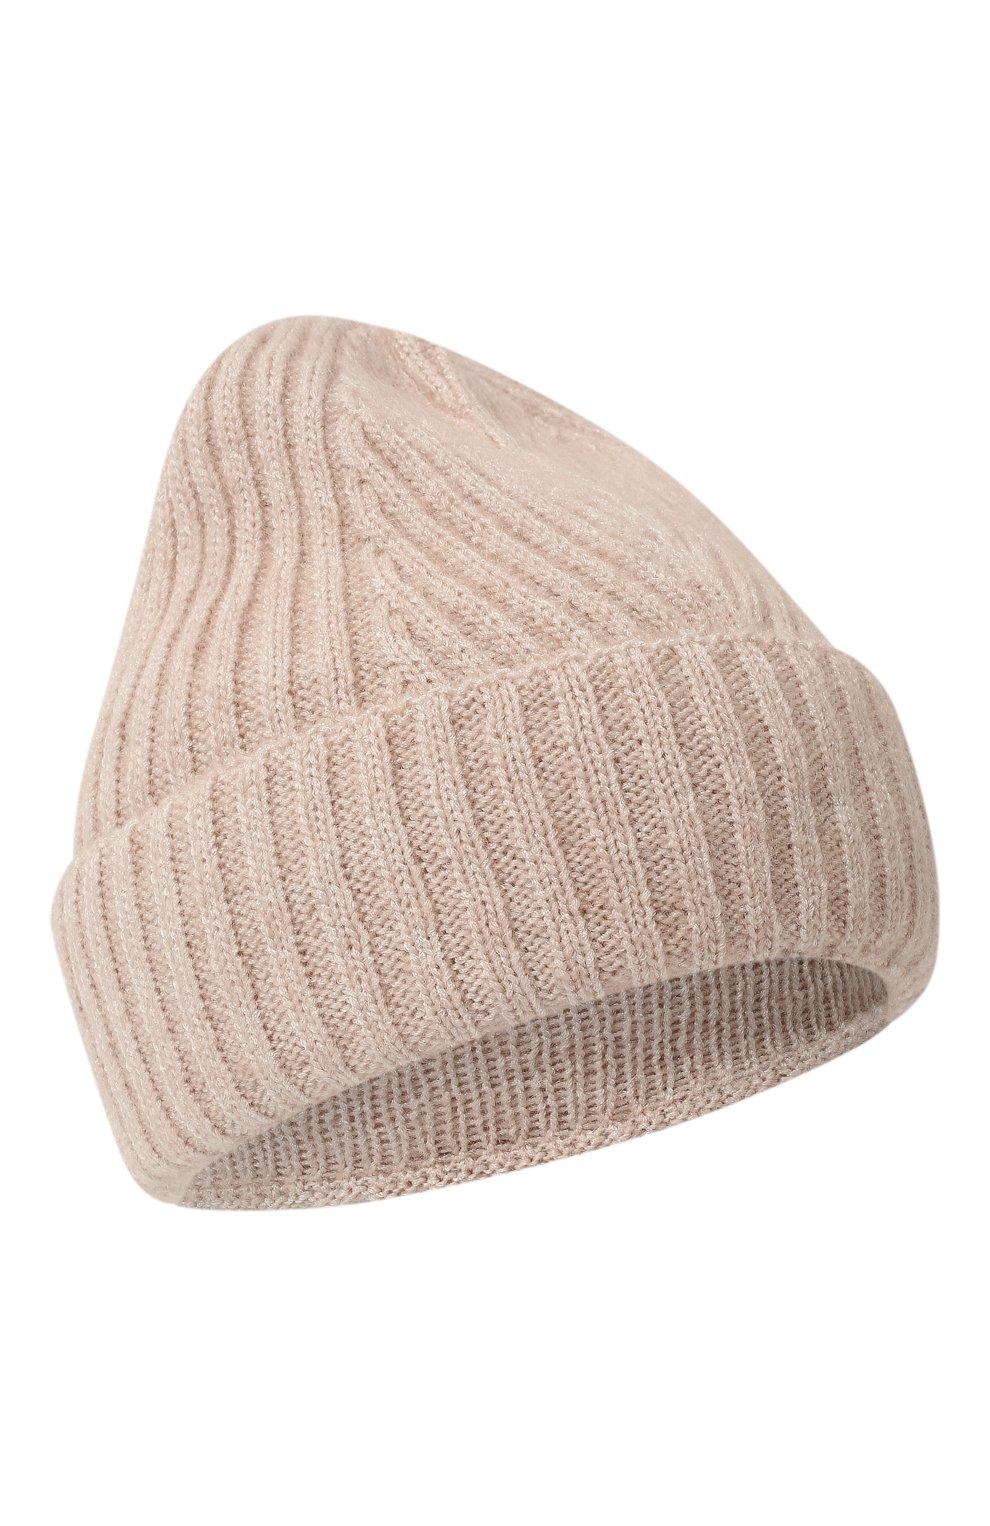 Женская шапка monica CANOE бежевого цвета, арт. 4918269 | Фото 1